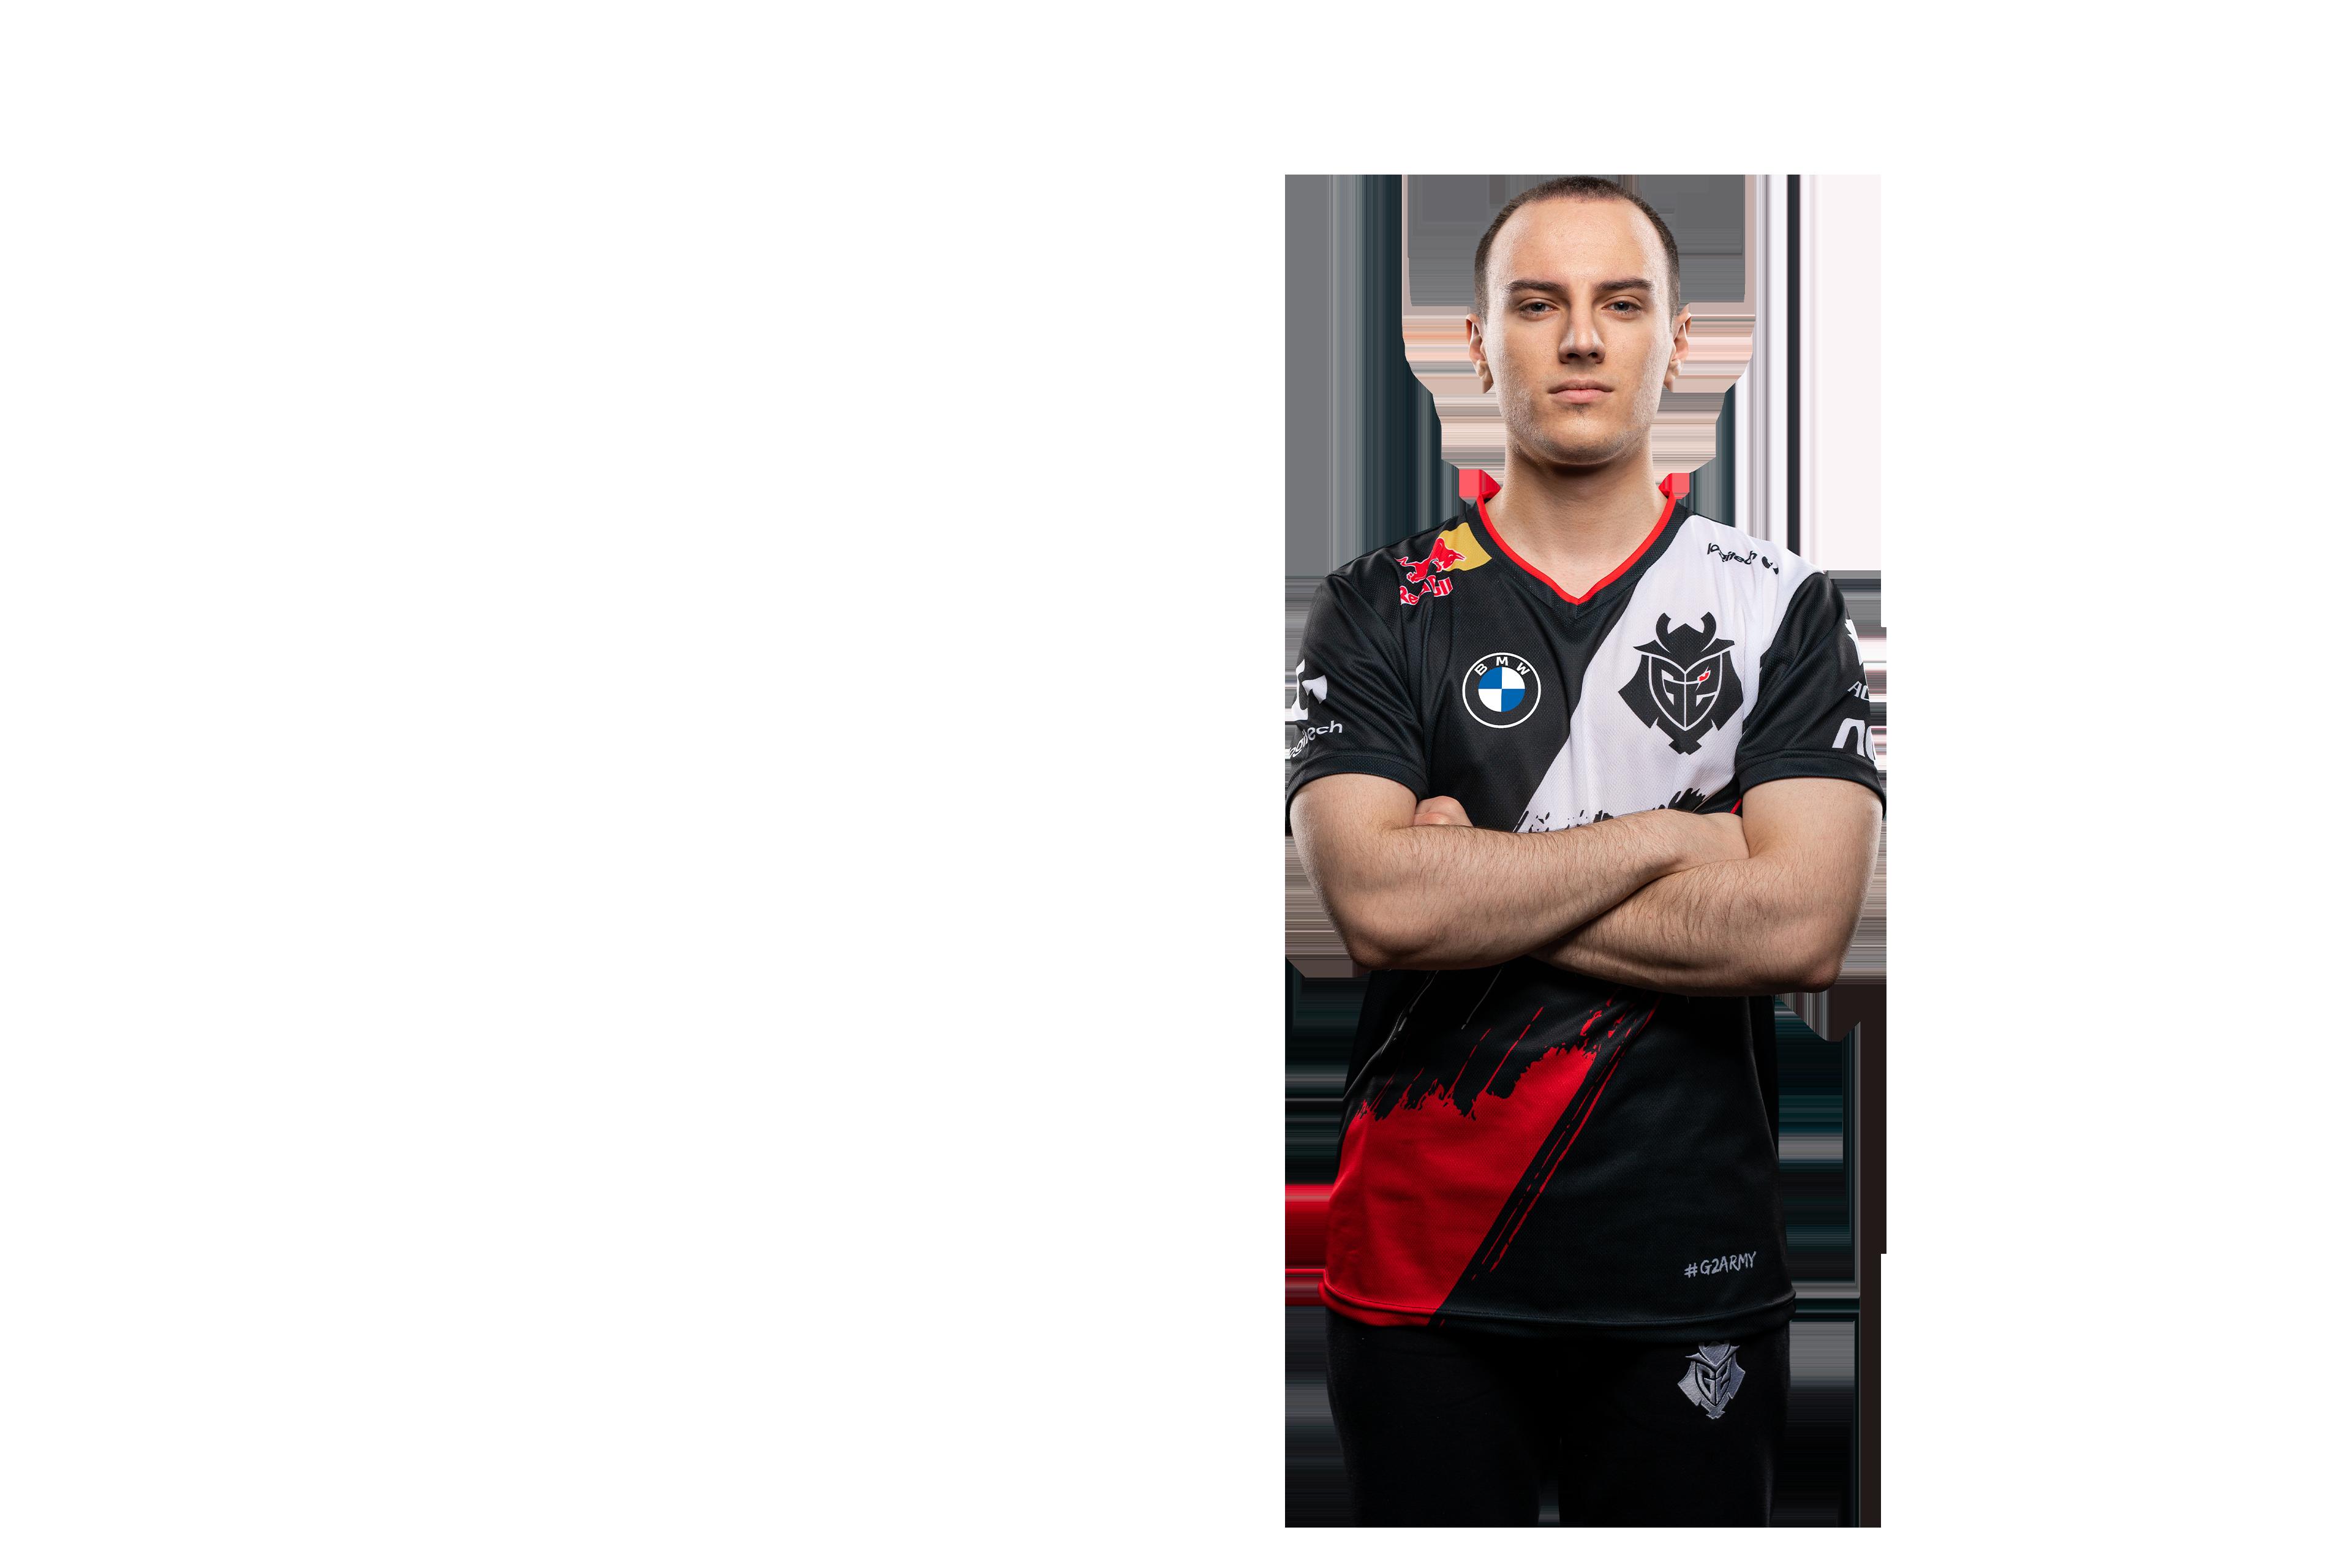 A headshot of G2 Esports League of Legends player Perkz